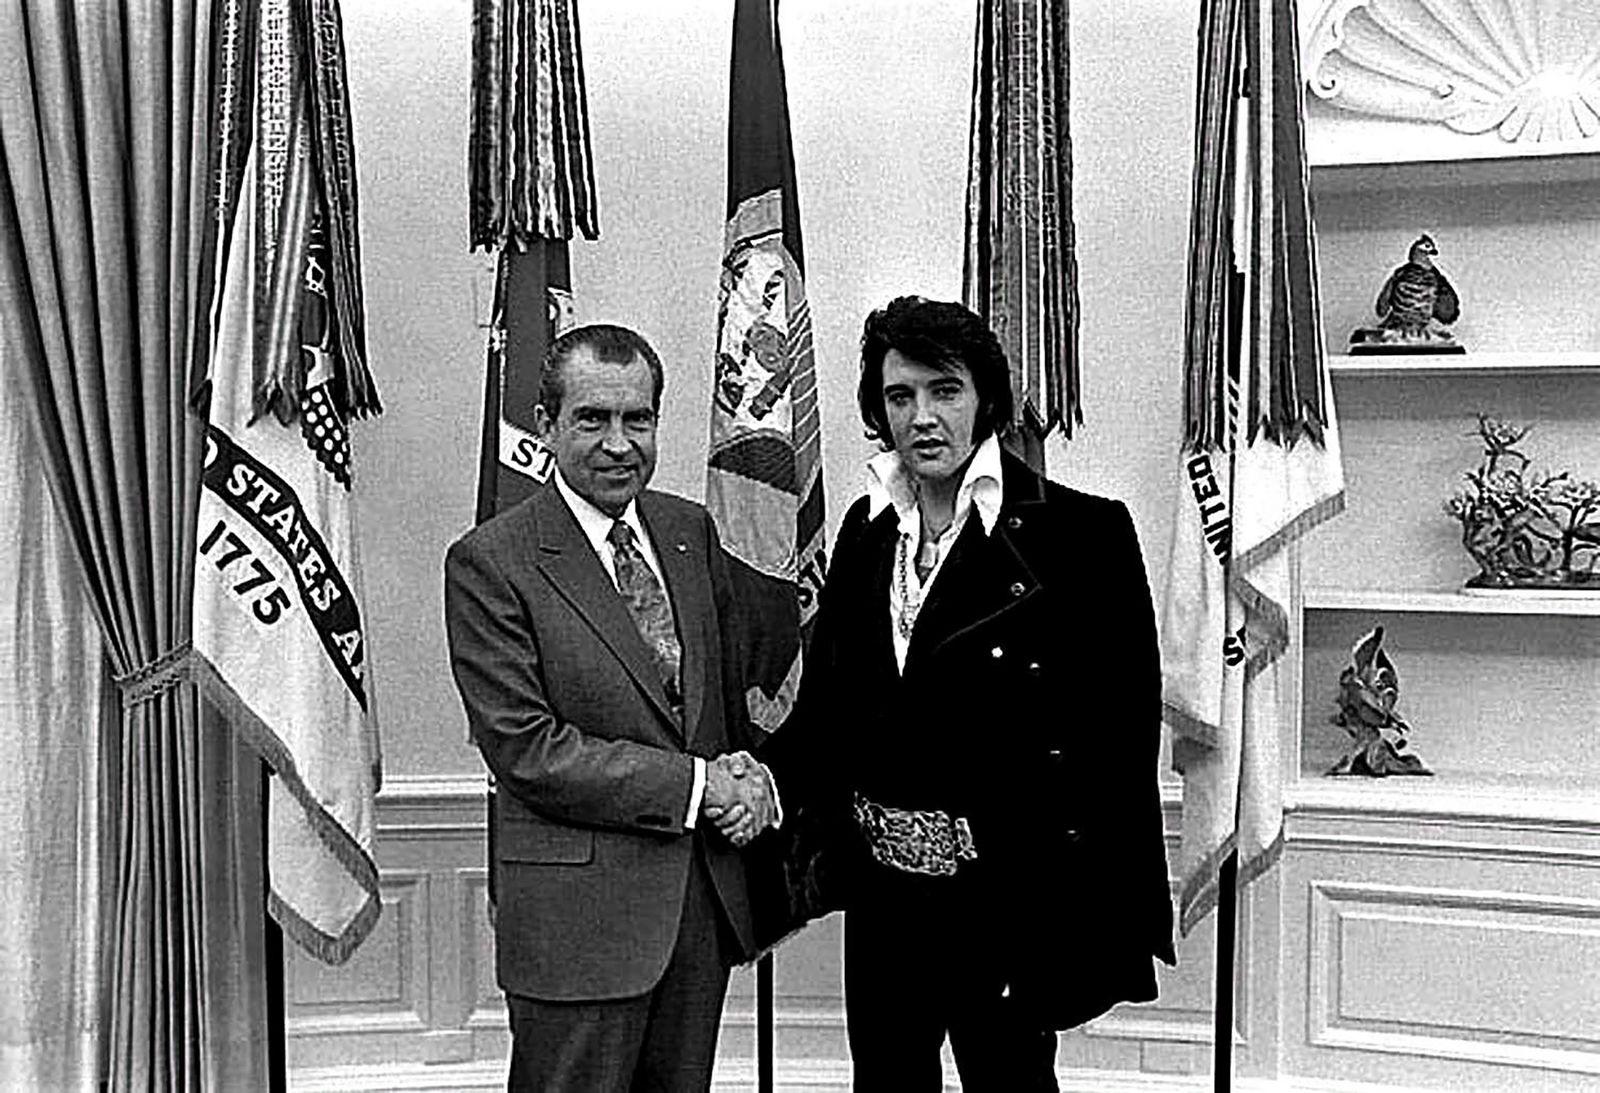 Elvis Presley - 40th anniversary of Richard Nixon's resignation as US President